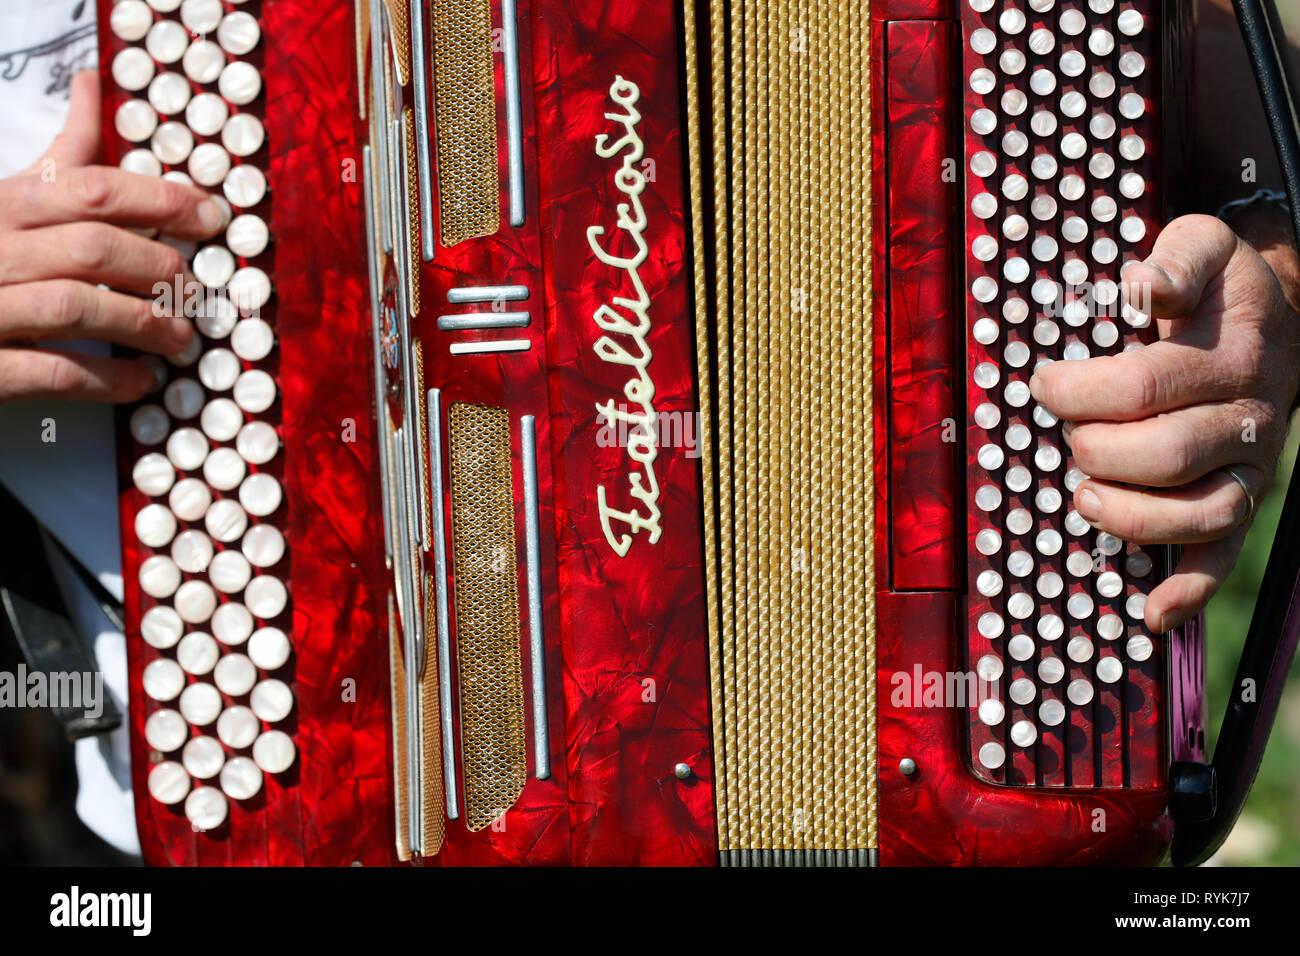 Accordion Band Stock Photos & Accordion Band Stock Images - Alamy